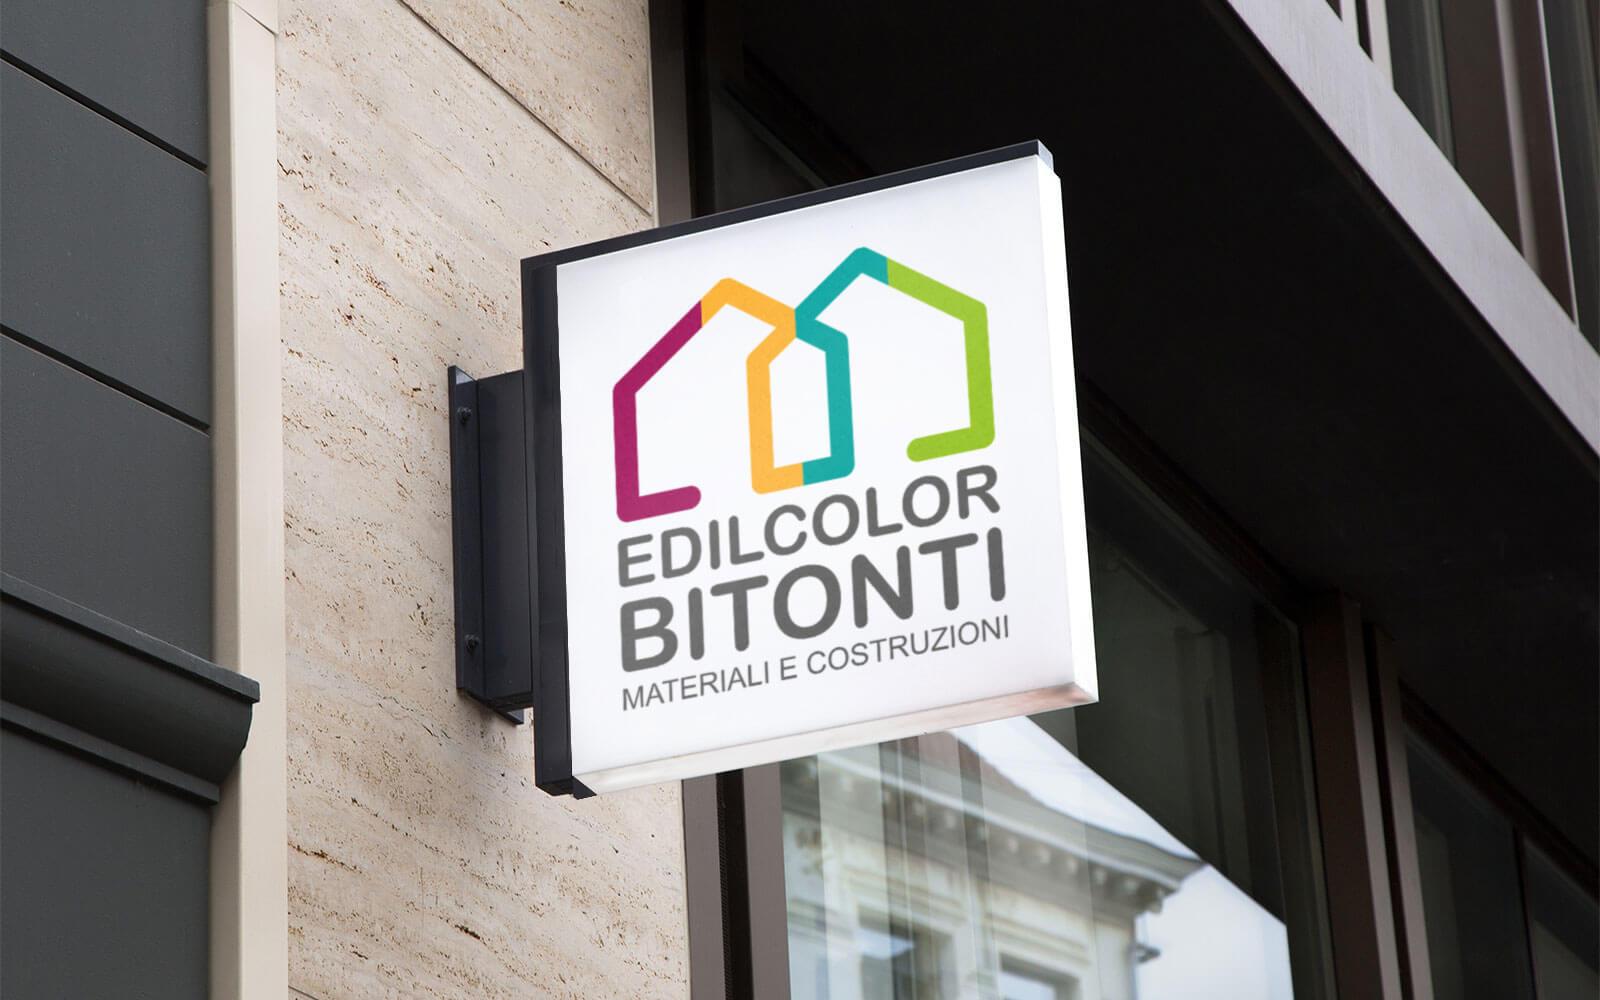 Edilcolor Bitonti – Brand identity